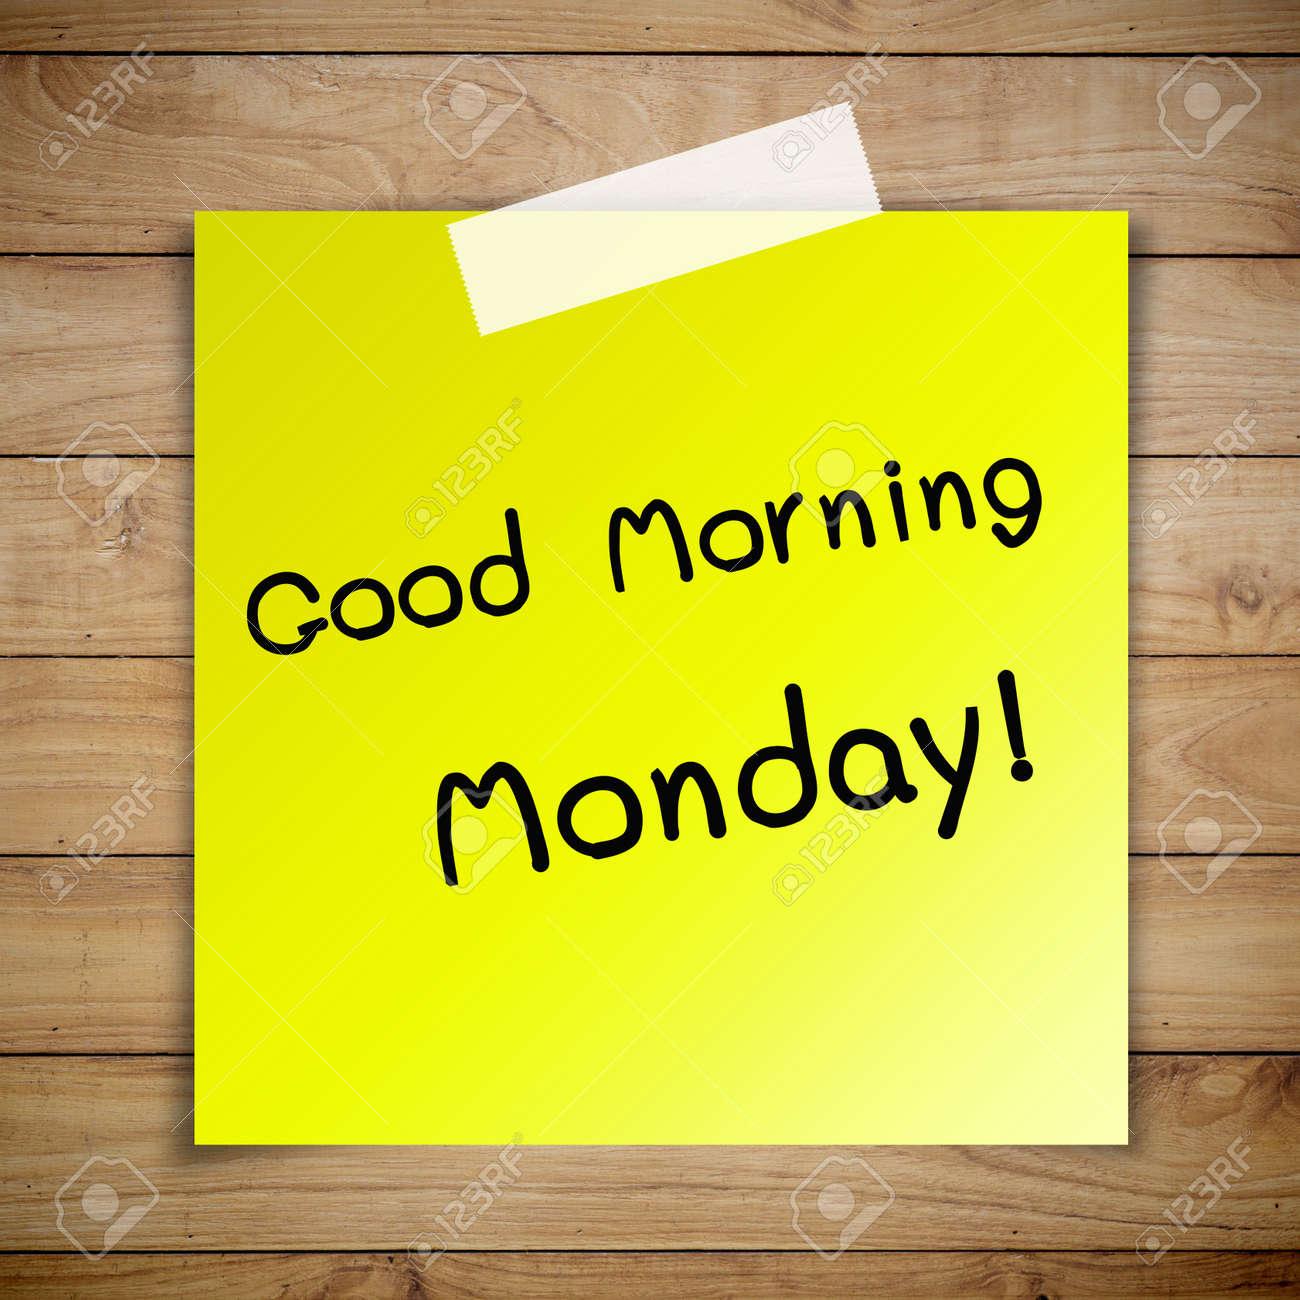 Good Morning Monday Images Good morning monday on sticky